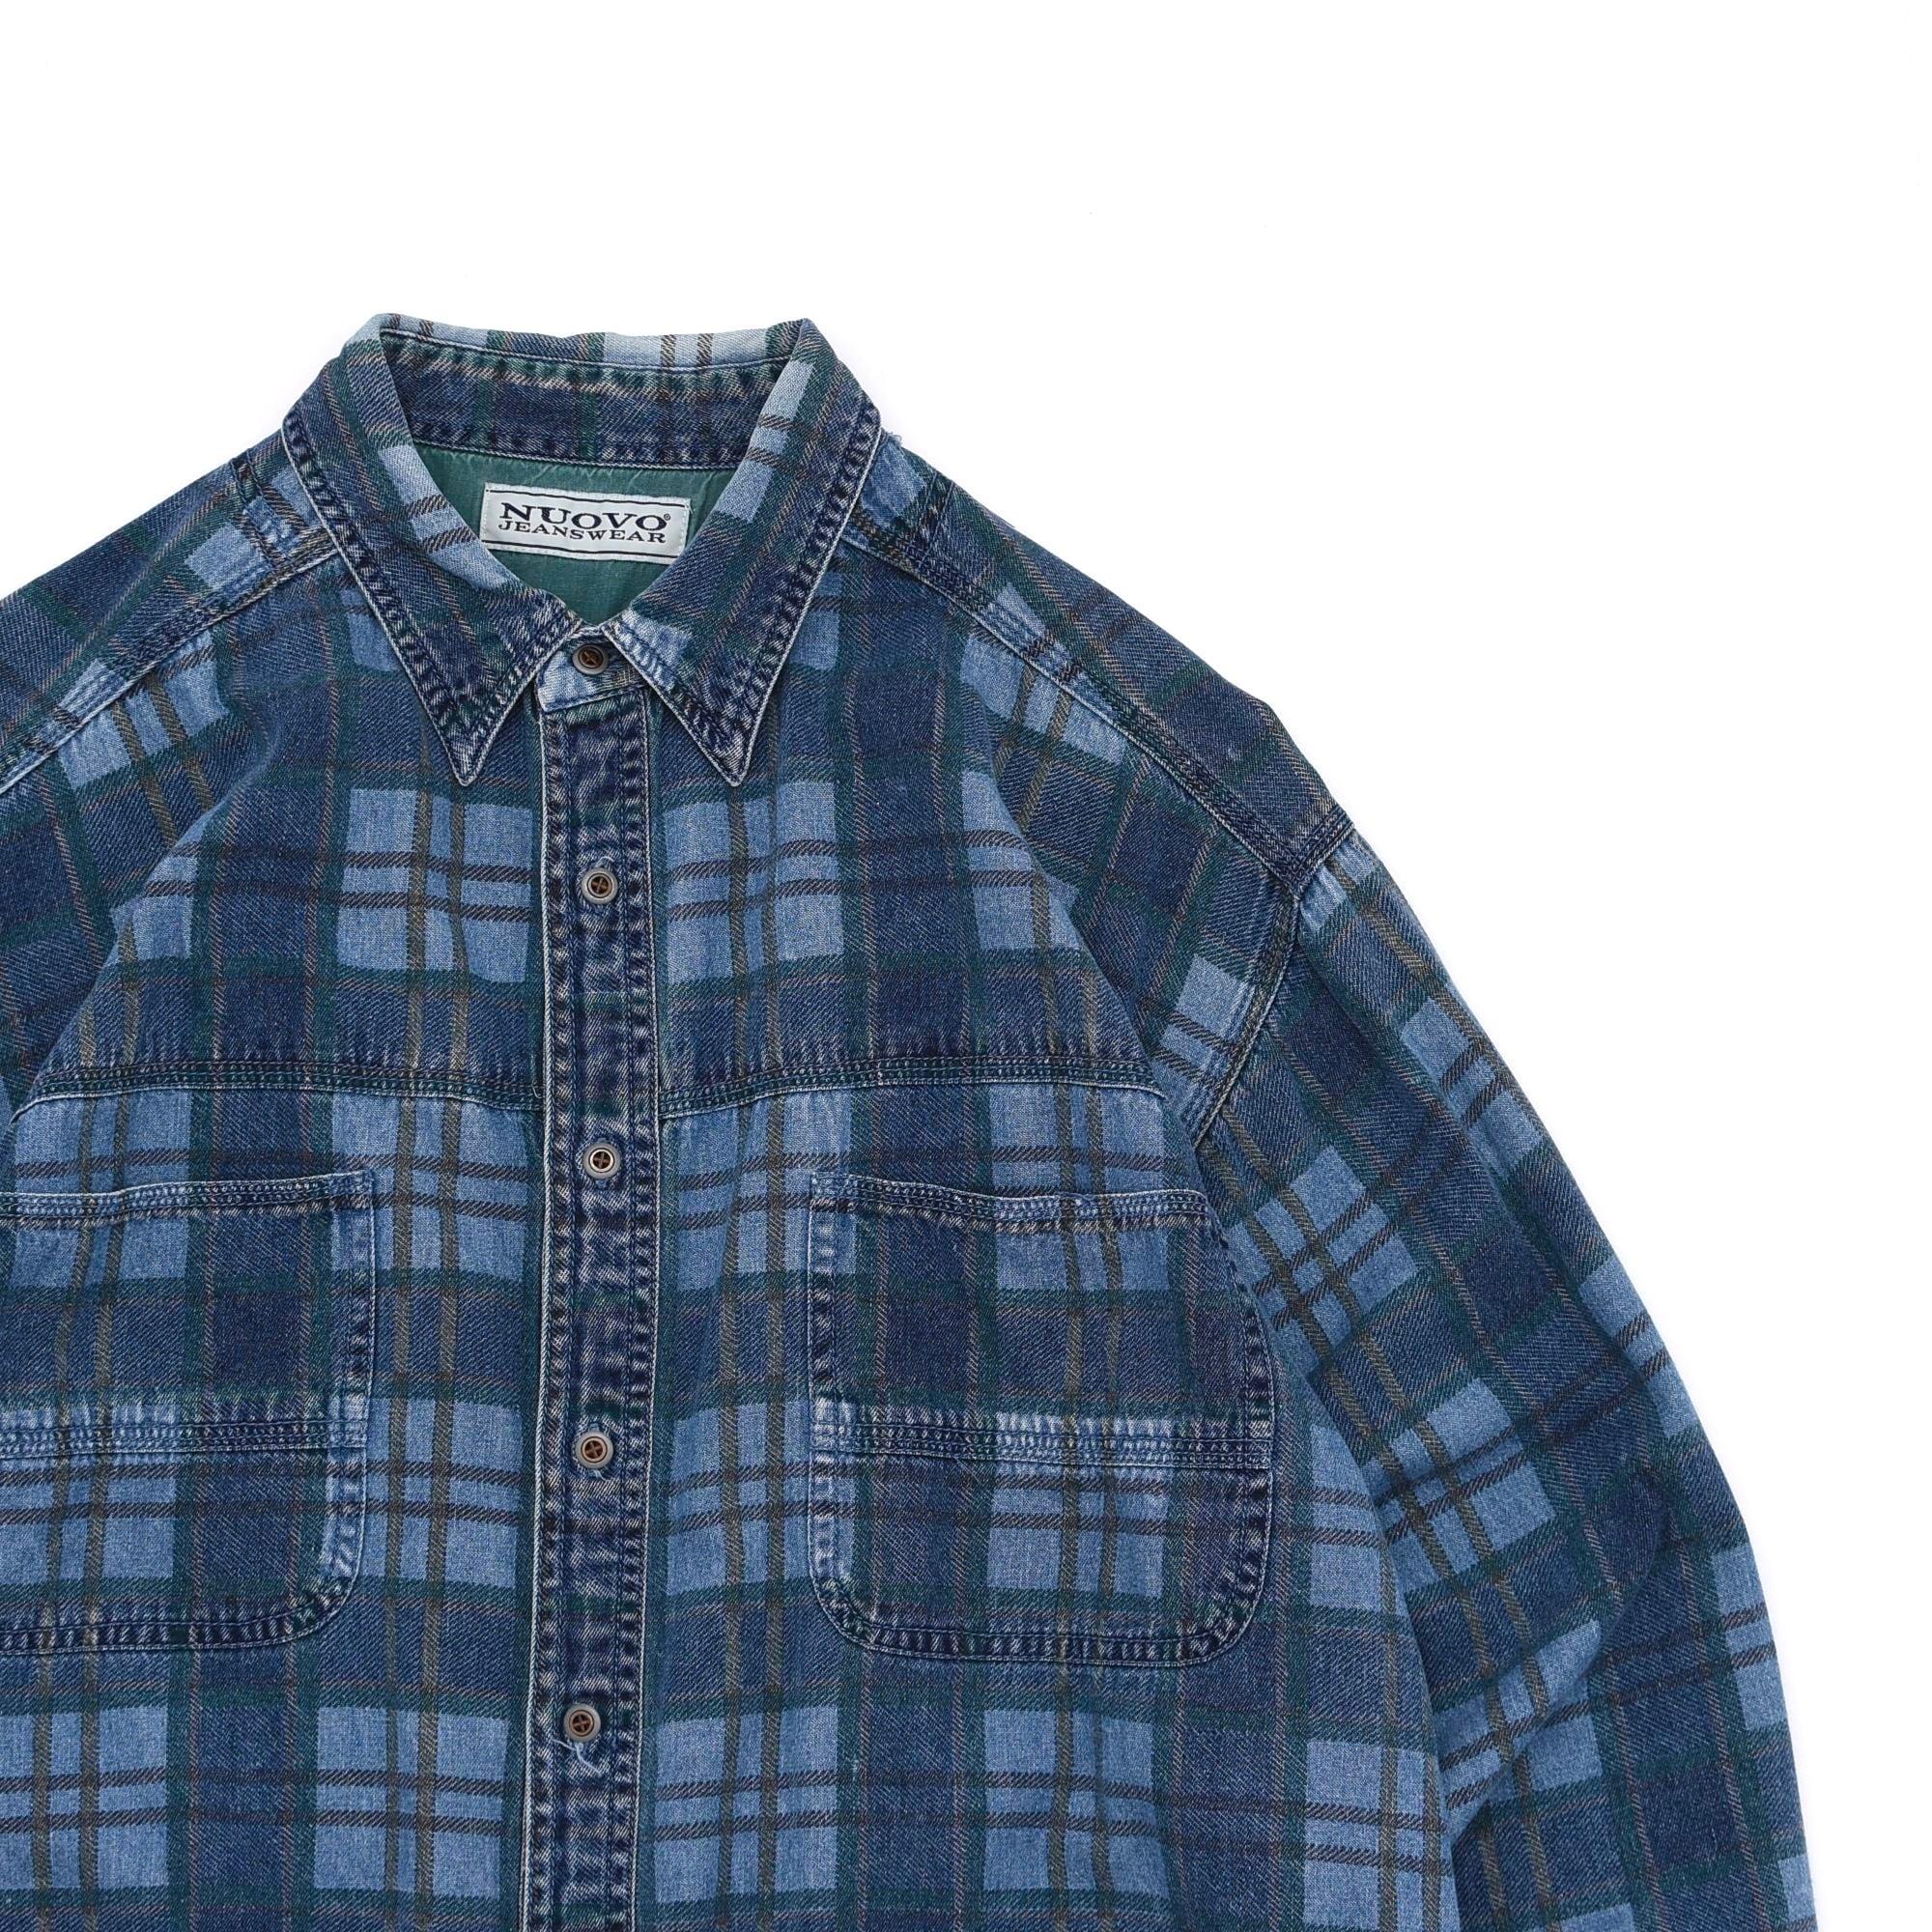 90's NUOVO print check denim work shirt